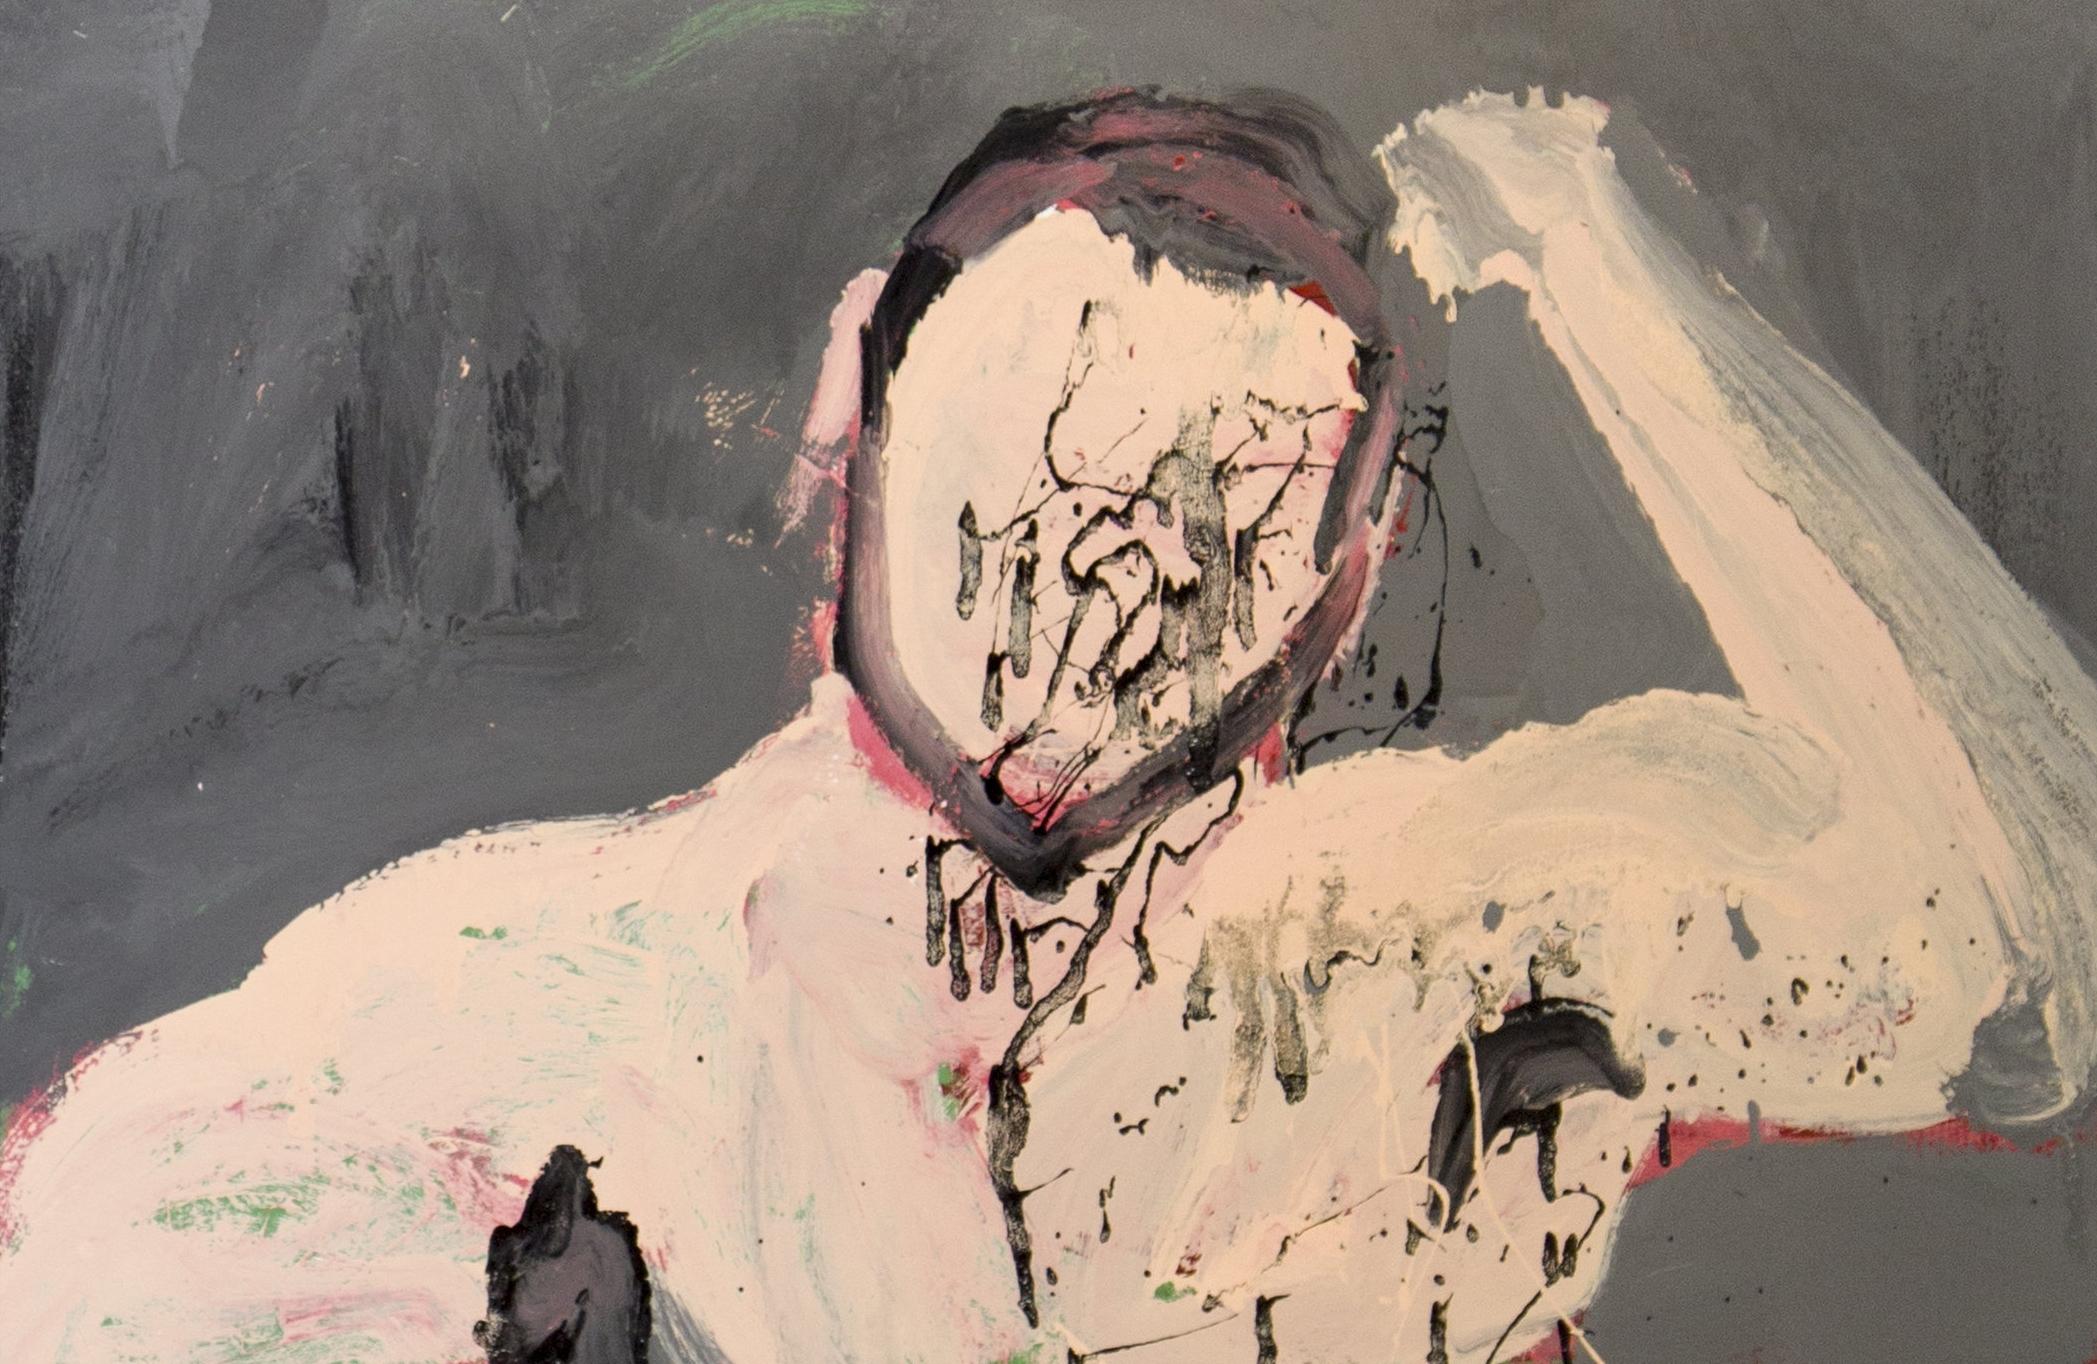 Insta Love: Obaid being Obaid, 2017, enamel paint on Canvas, 61 x 91 cm